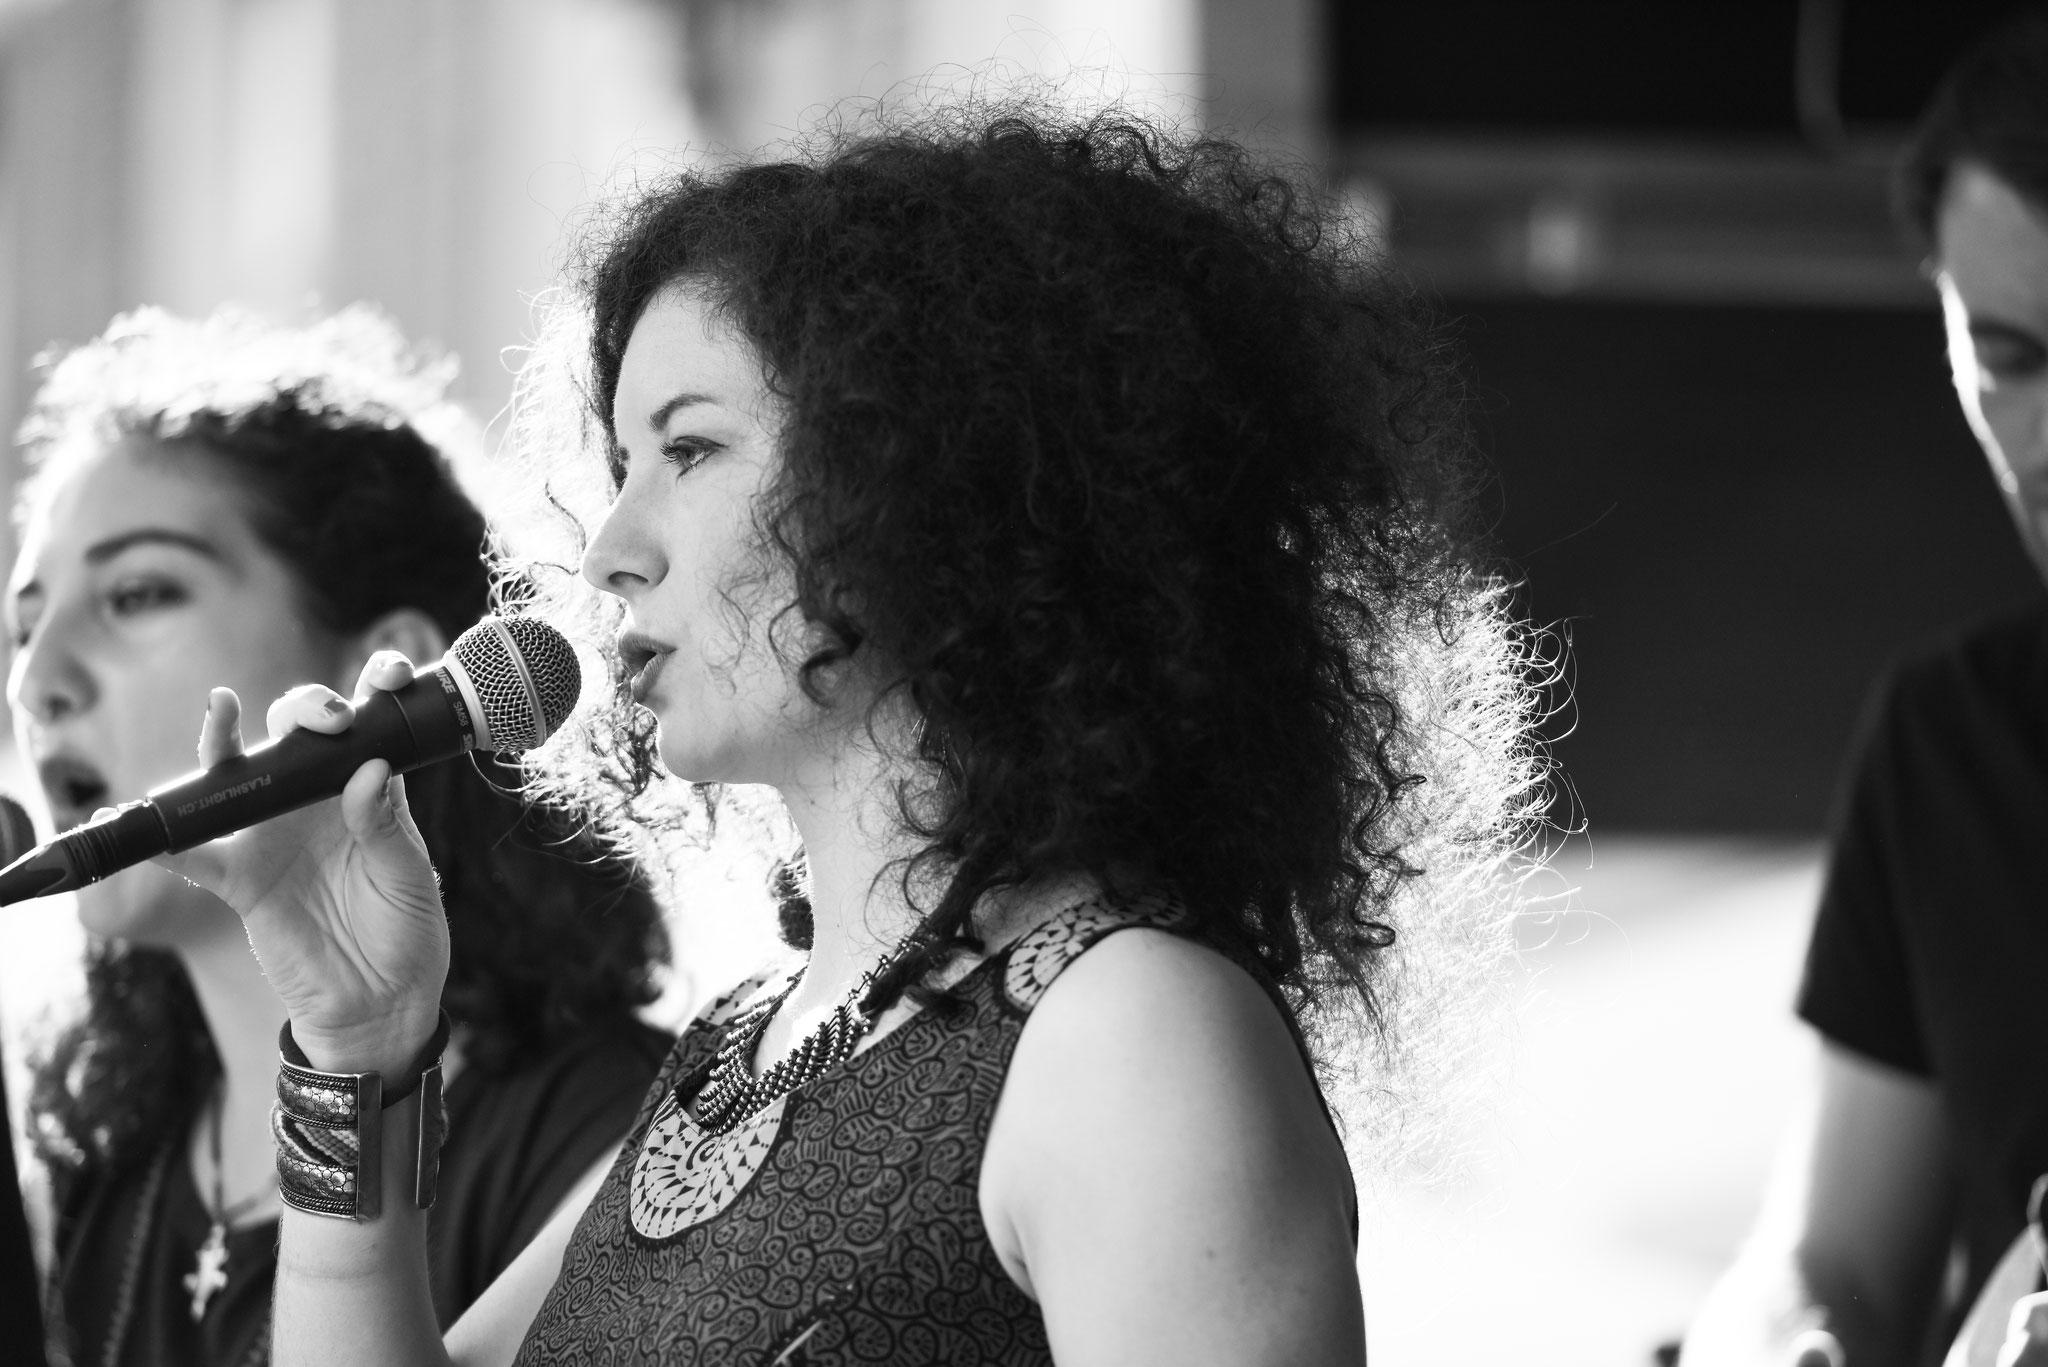 Afro-Pfingsten, 02.06.2017, Winterthur